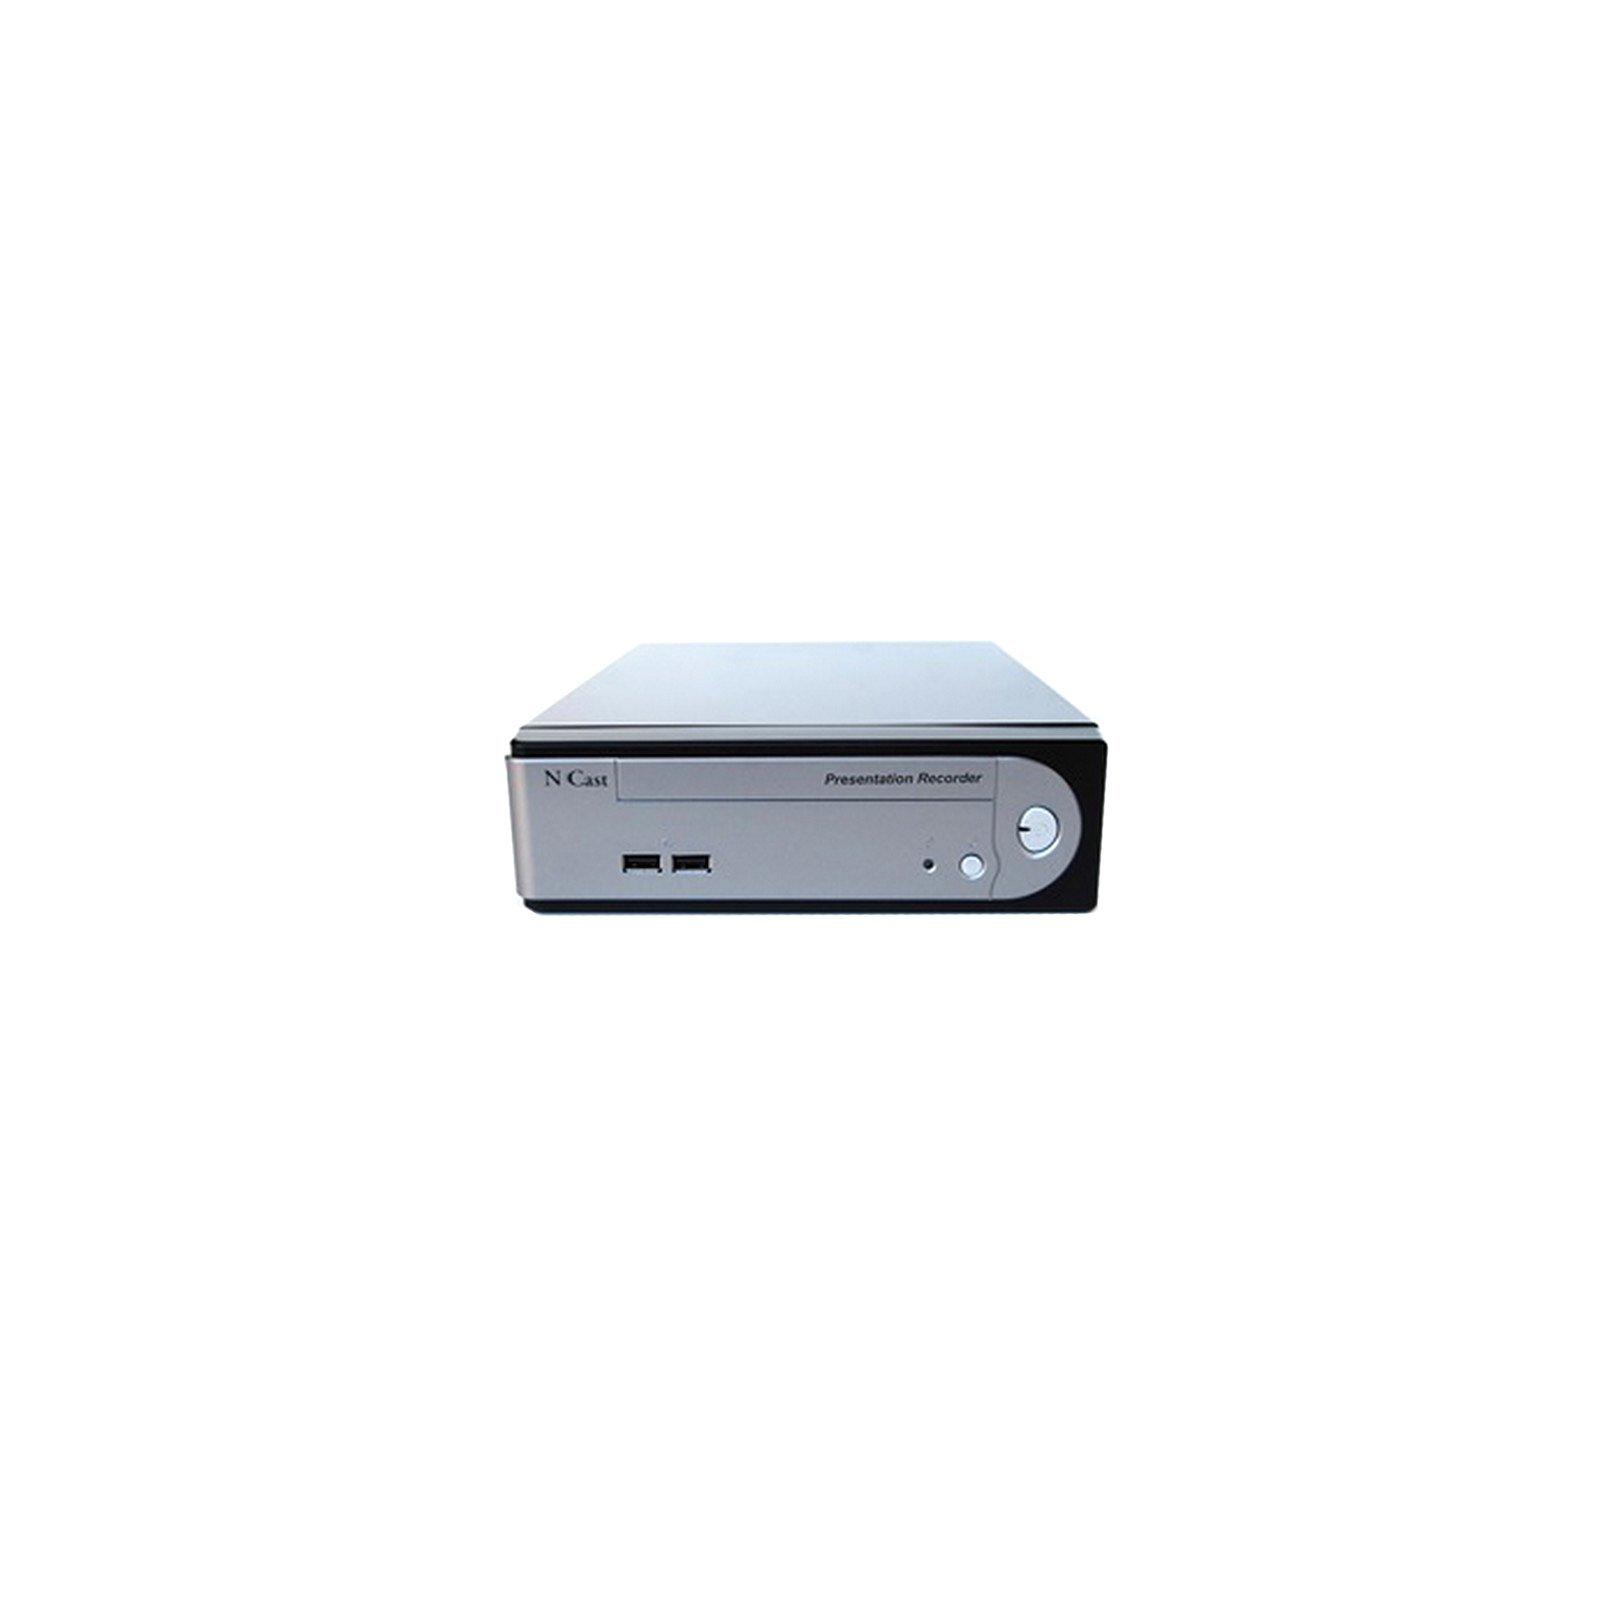 NCast PR-HD-Basic-M   720p Audio Video Compact Mobile Presentation Recorder